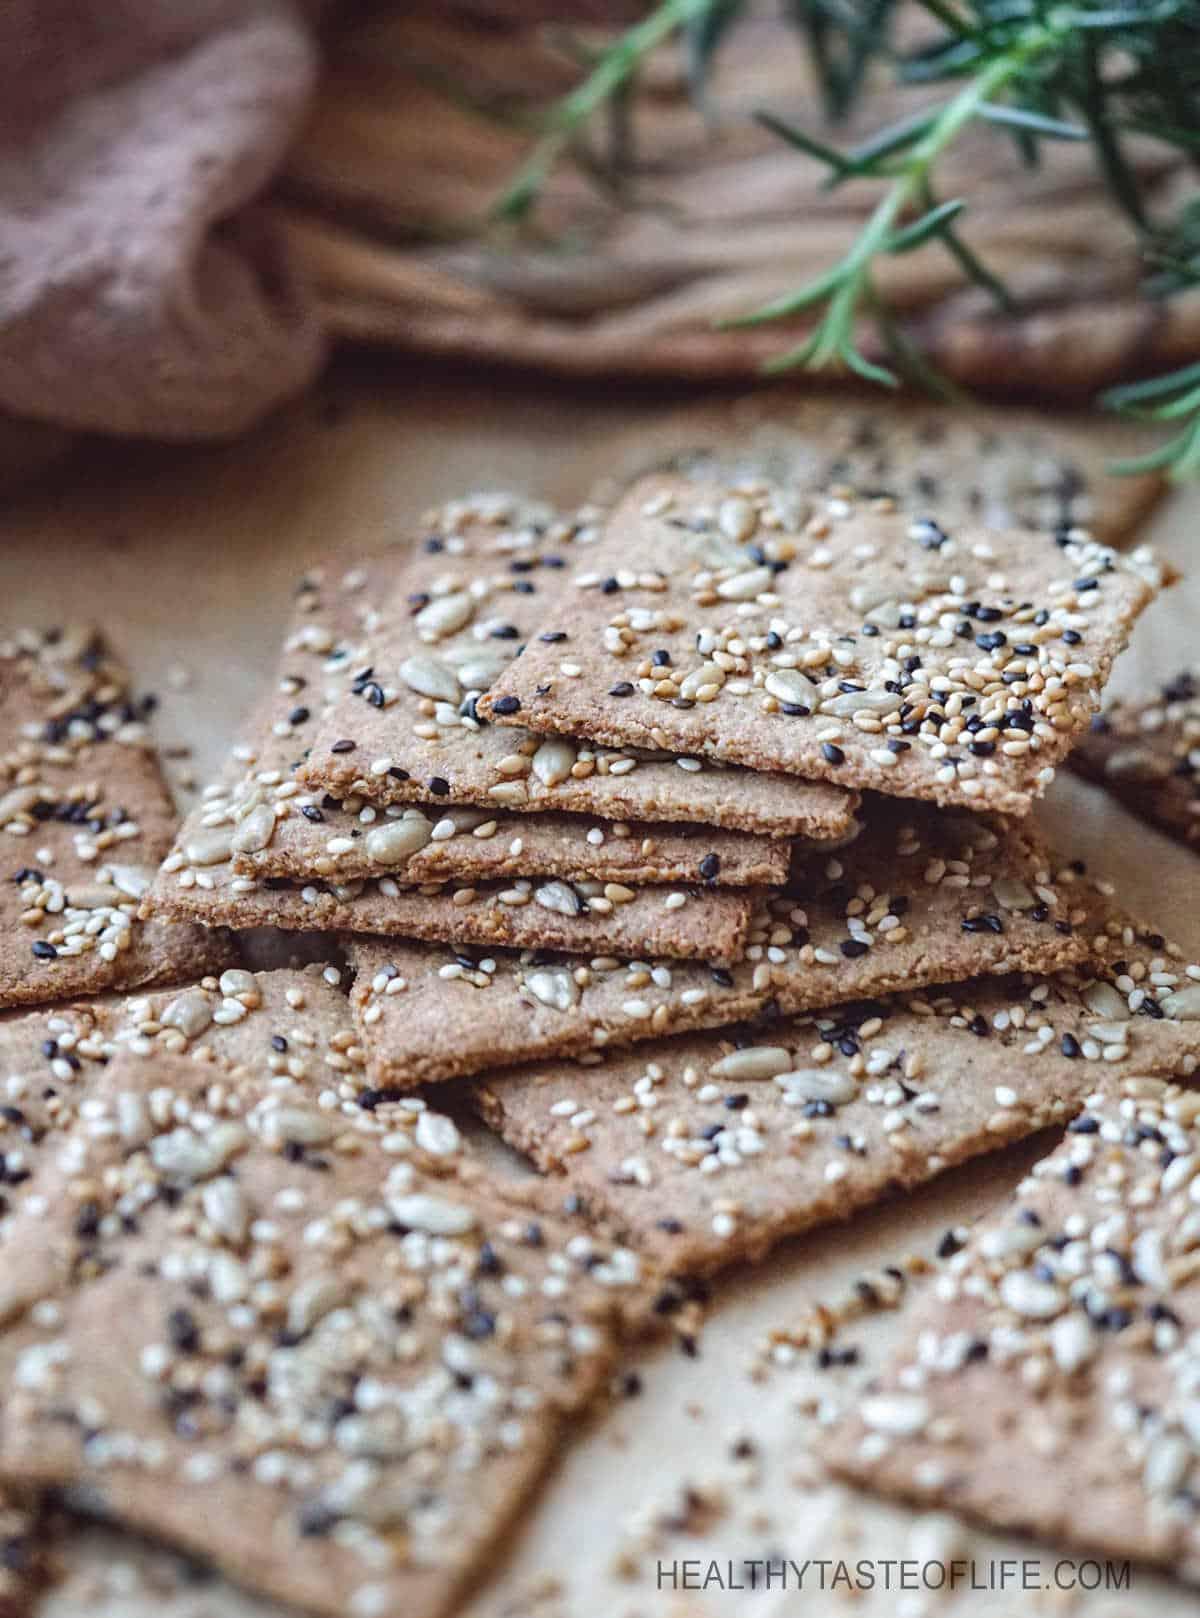 Keto crackers recipe (low carb, vegan, dairy free, nut free, grain free)  with seeds. #keto #lowcarb #crackers